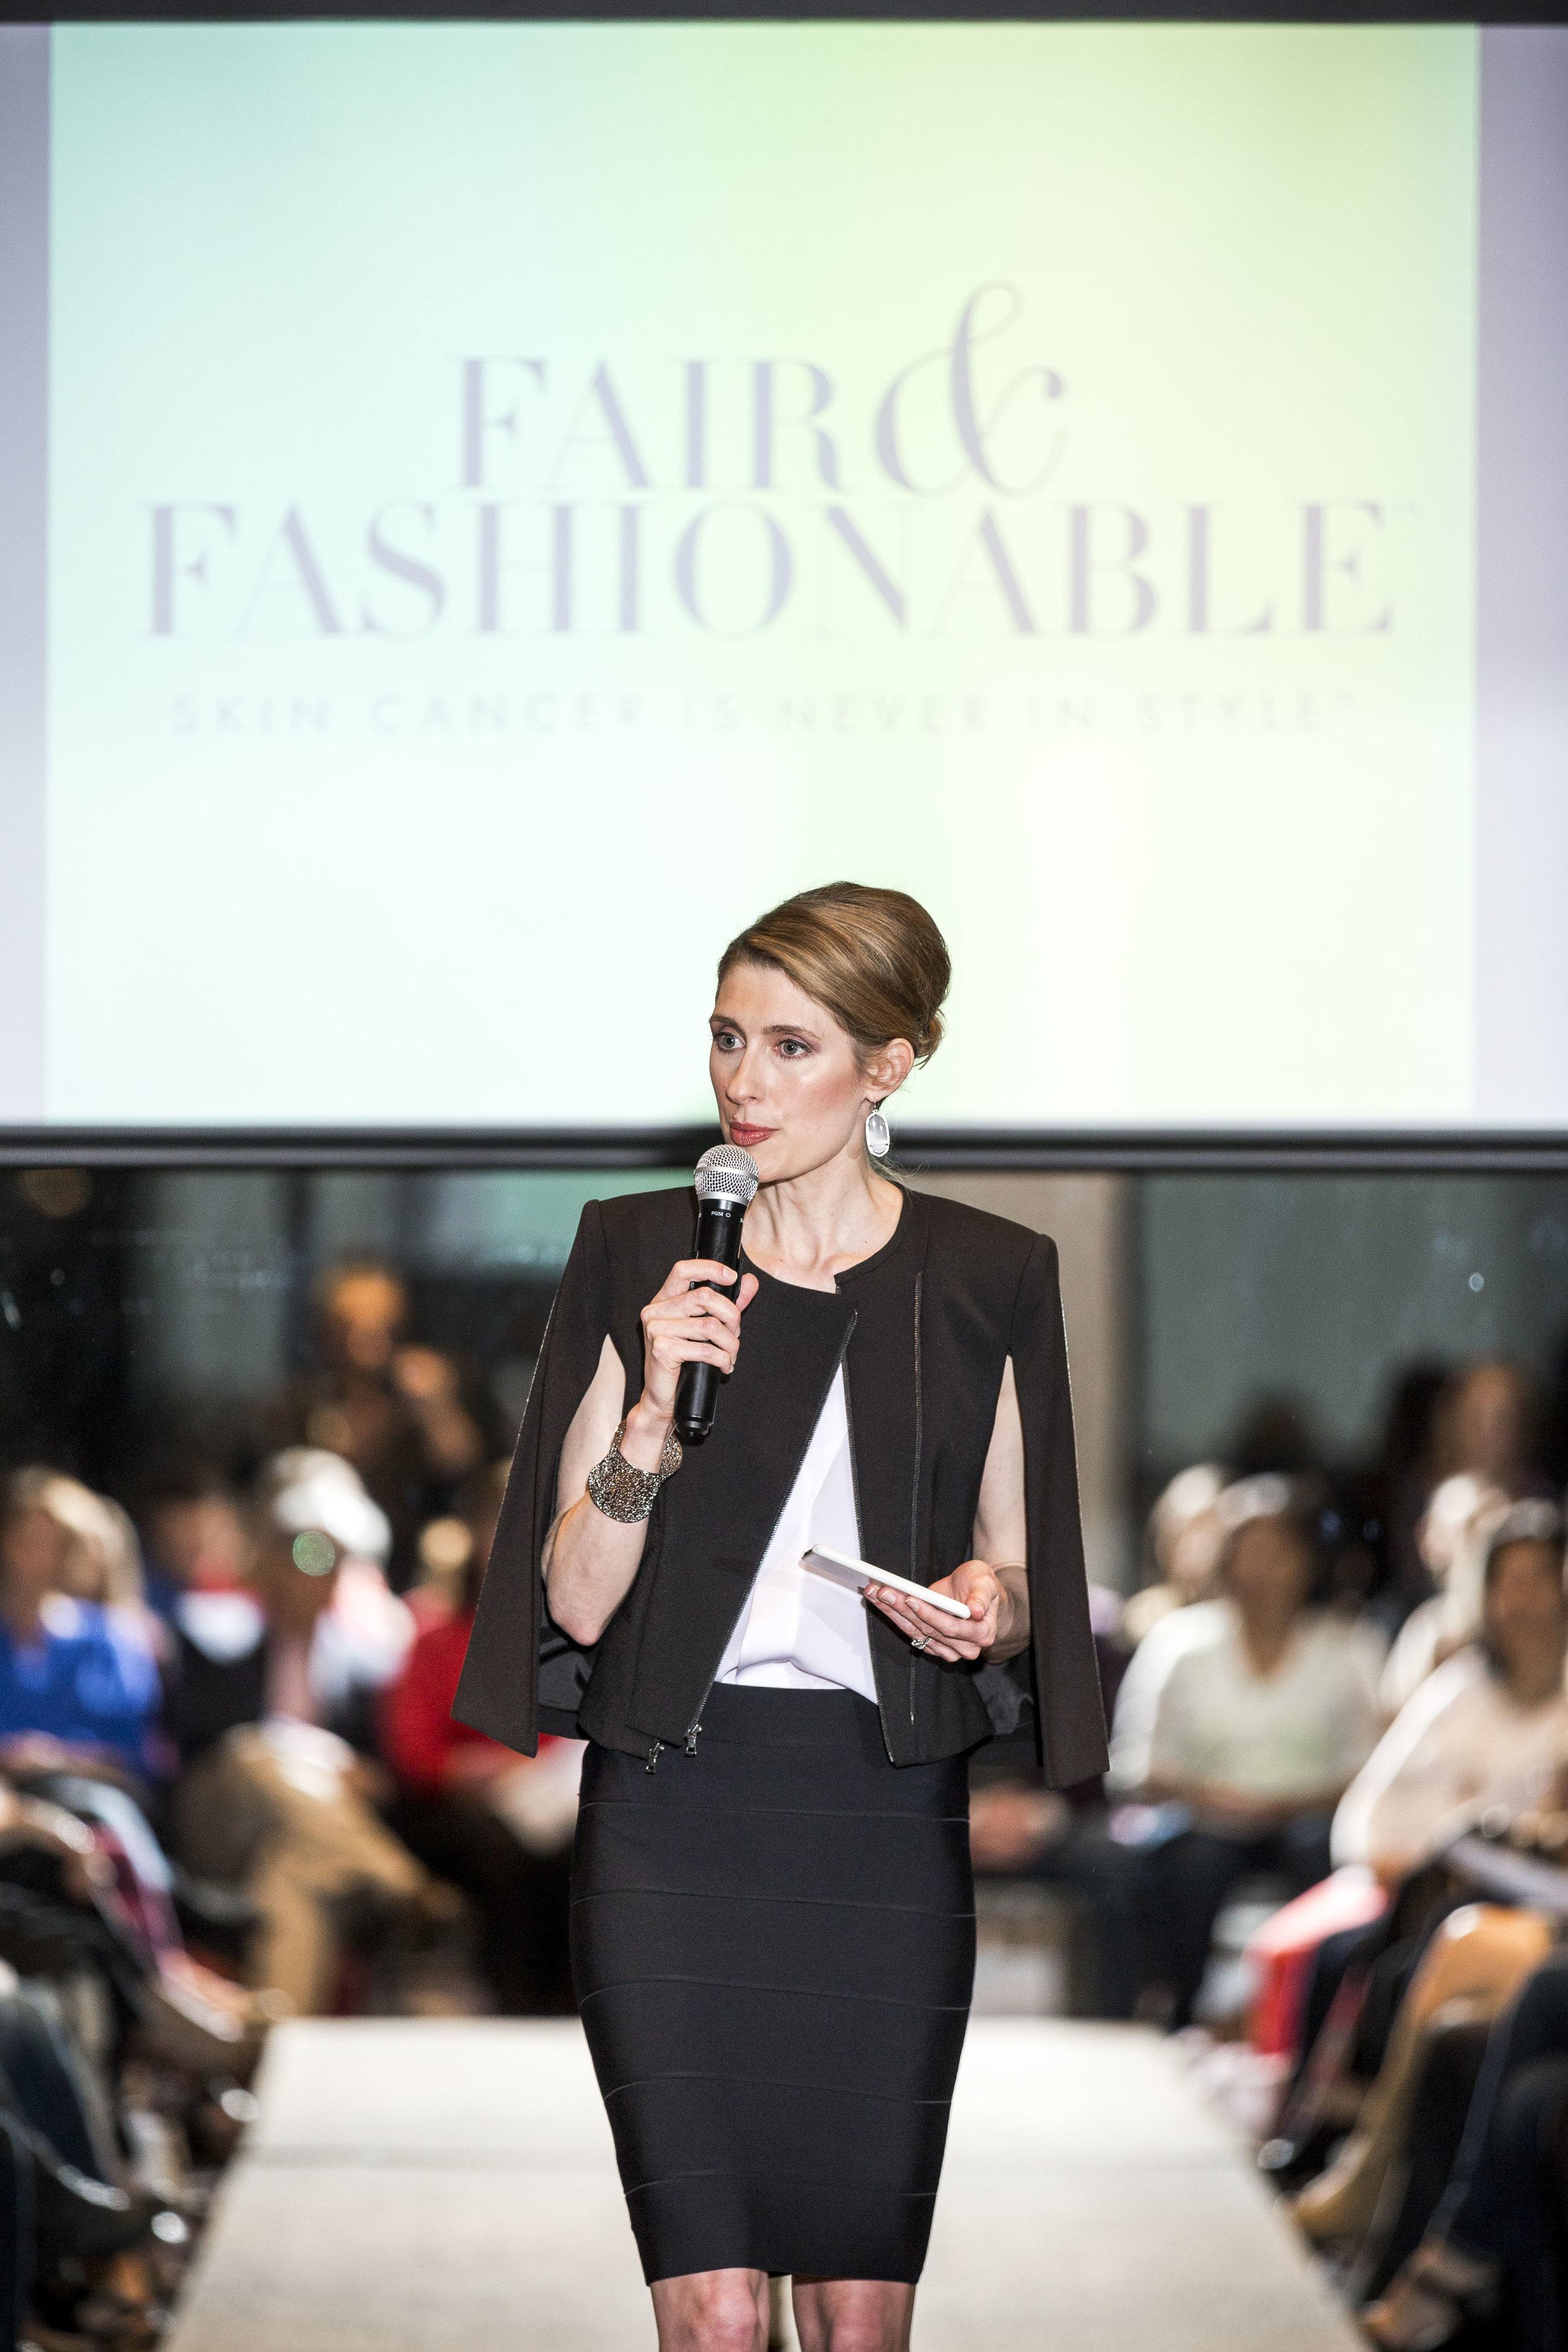 16-IMG_4948-FairandFashionable-FashionShow.JPG